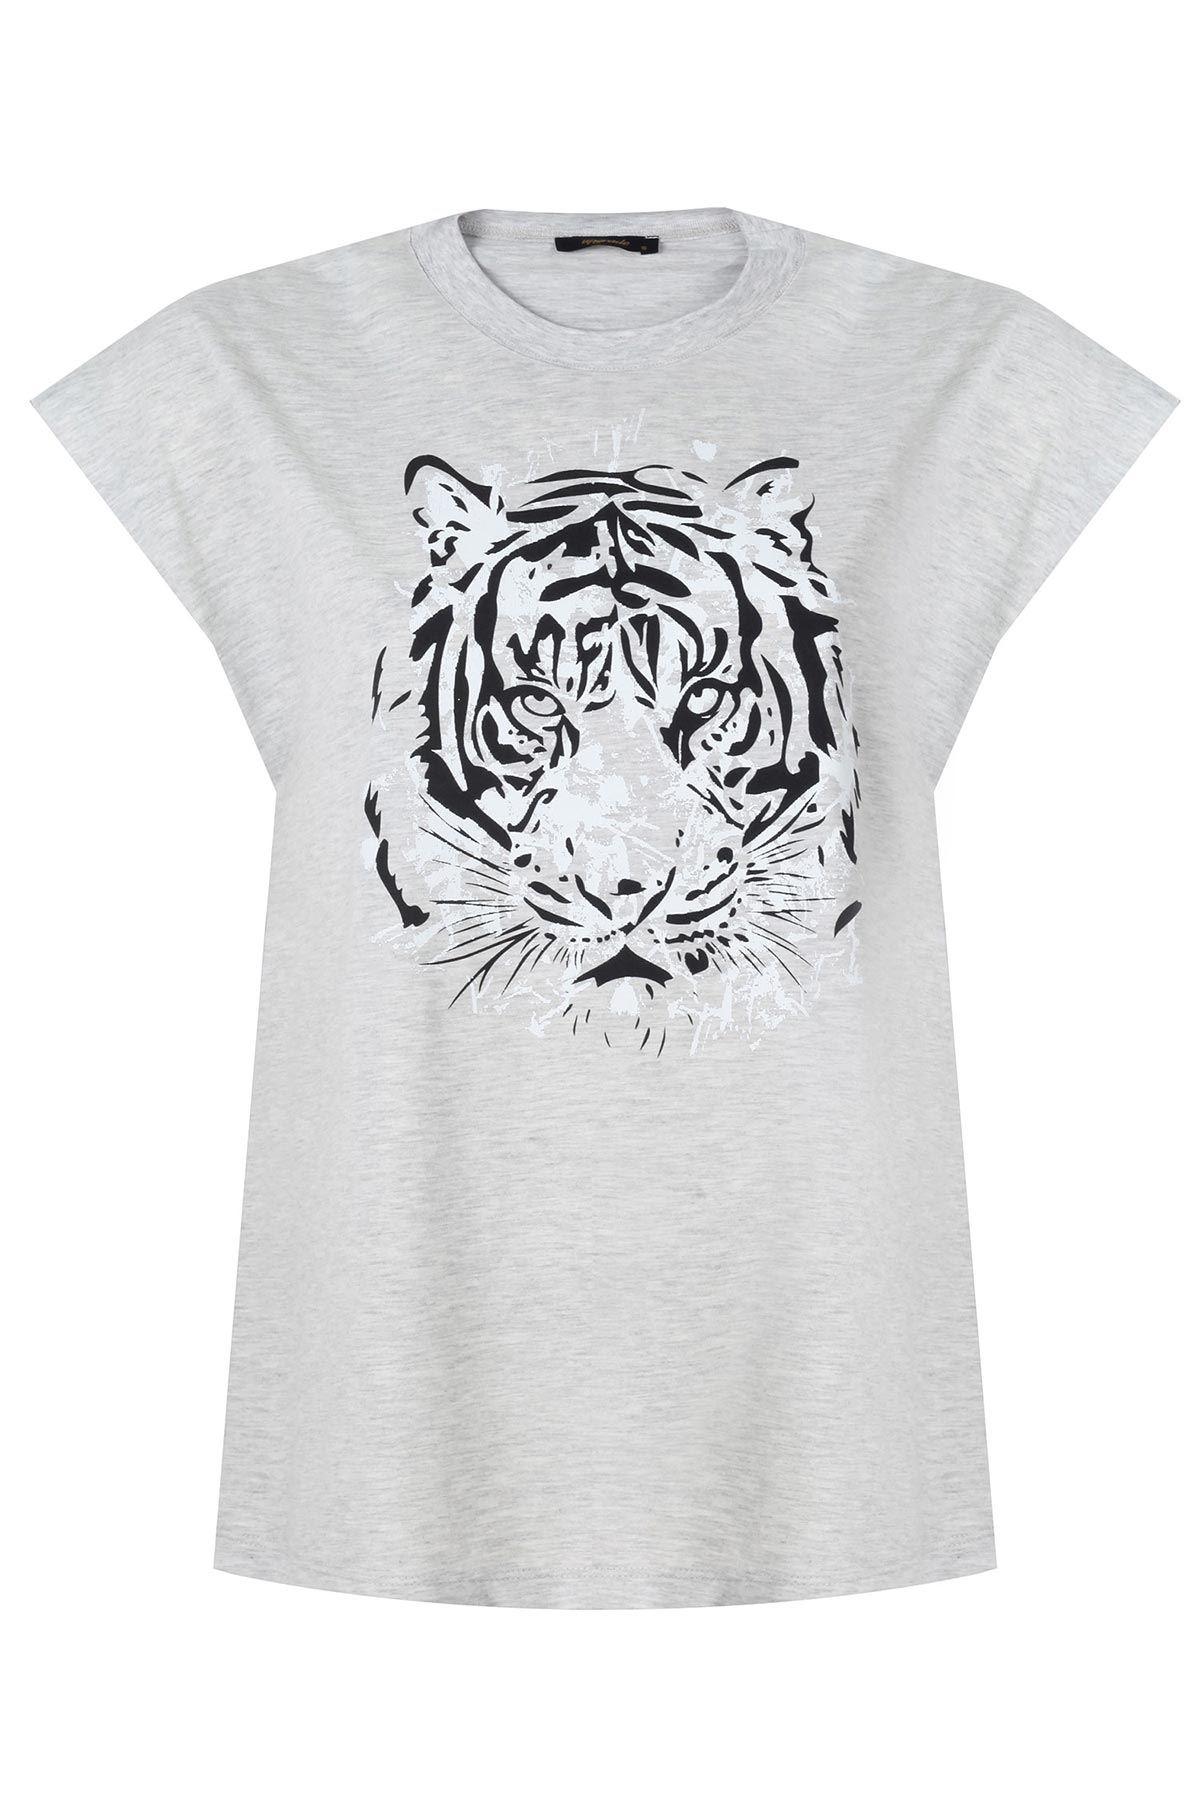 Kaplan desenli t-shirt Gri